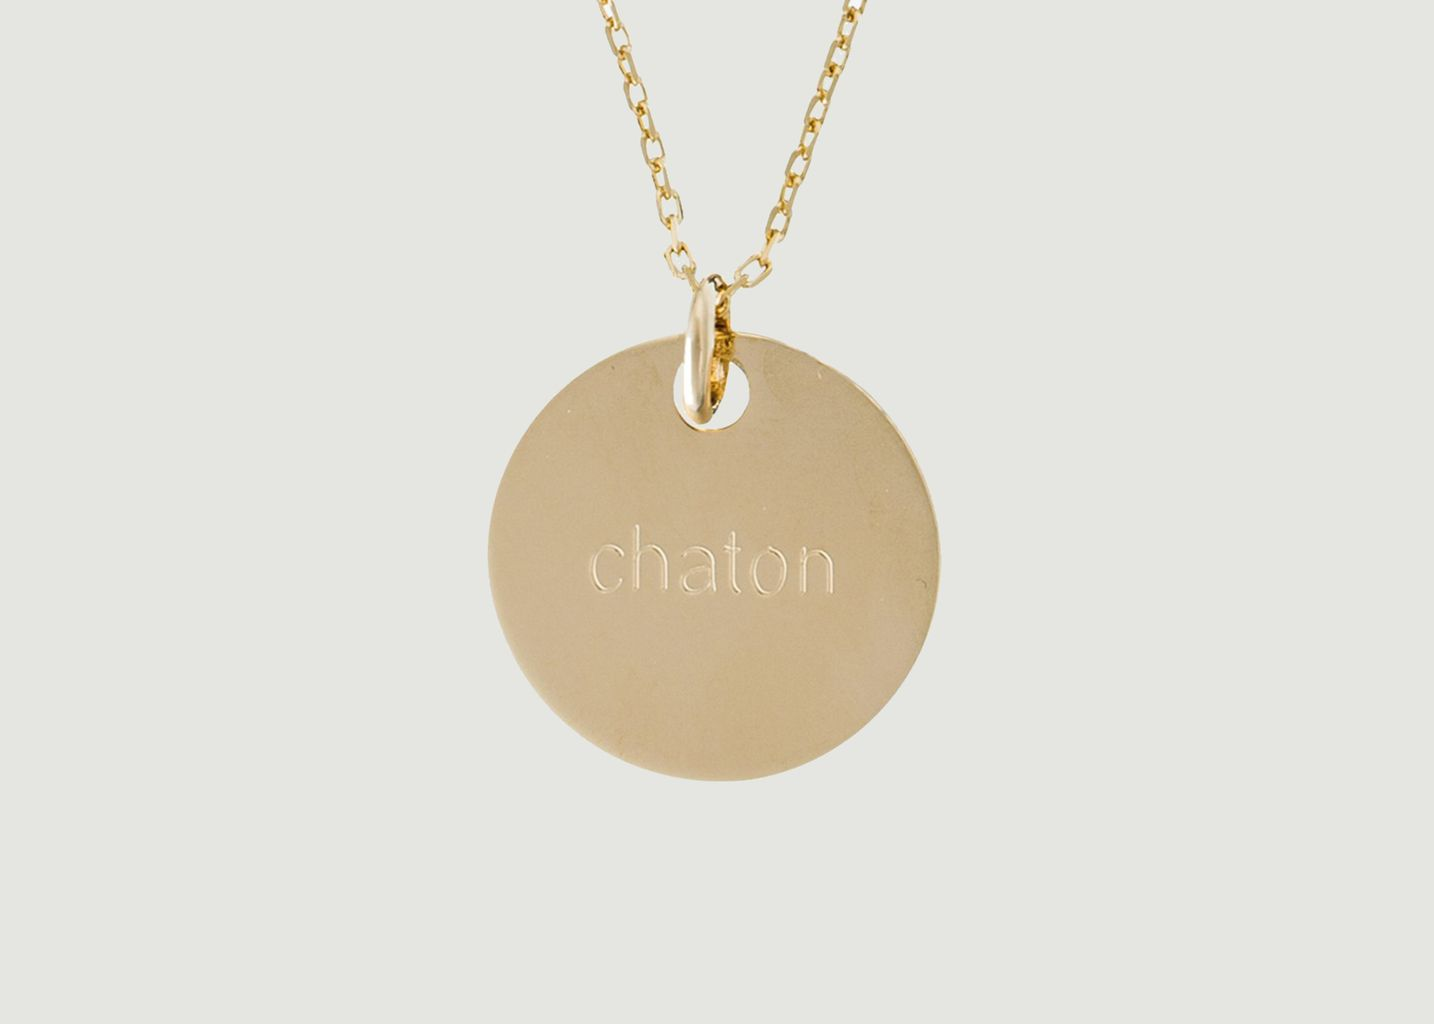 Collier Chaton - Felicie Aussi